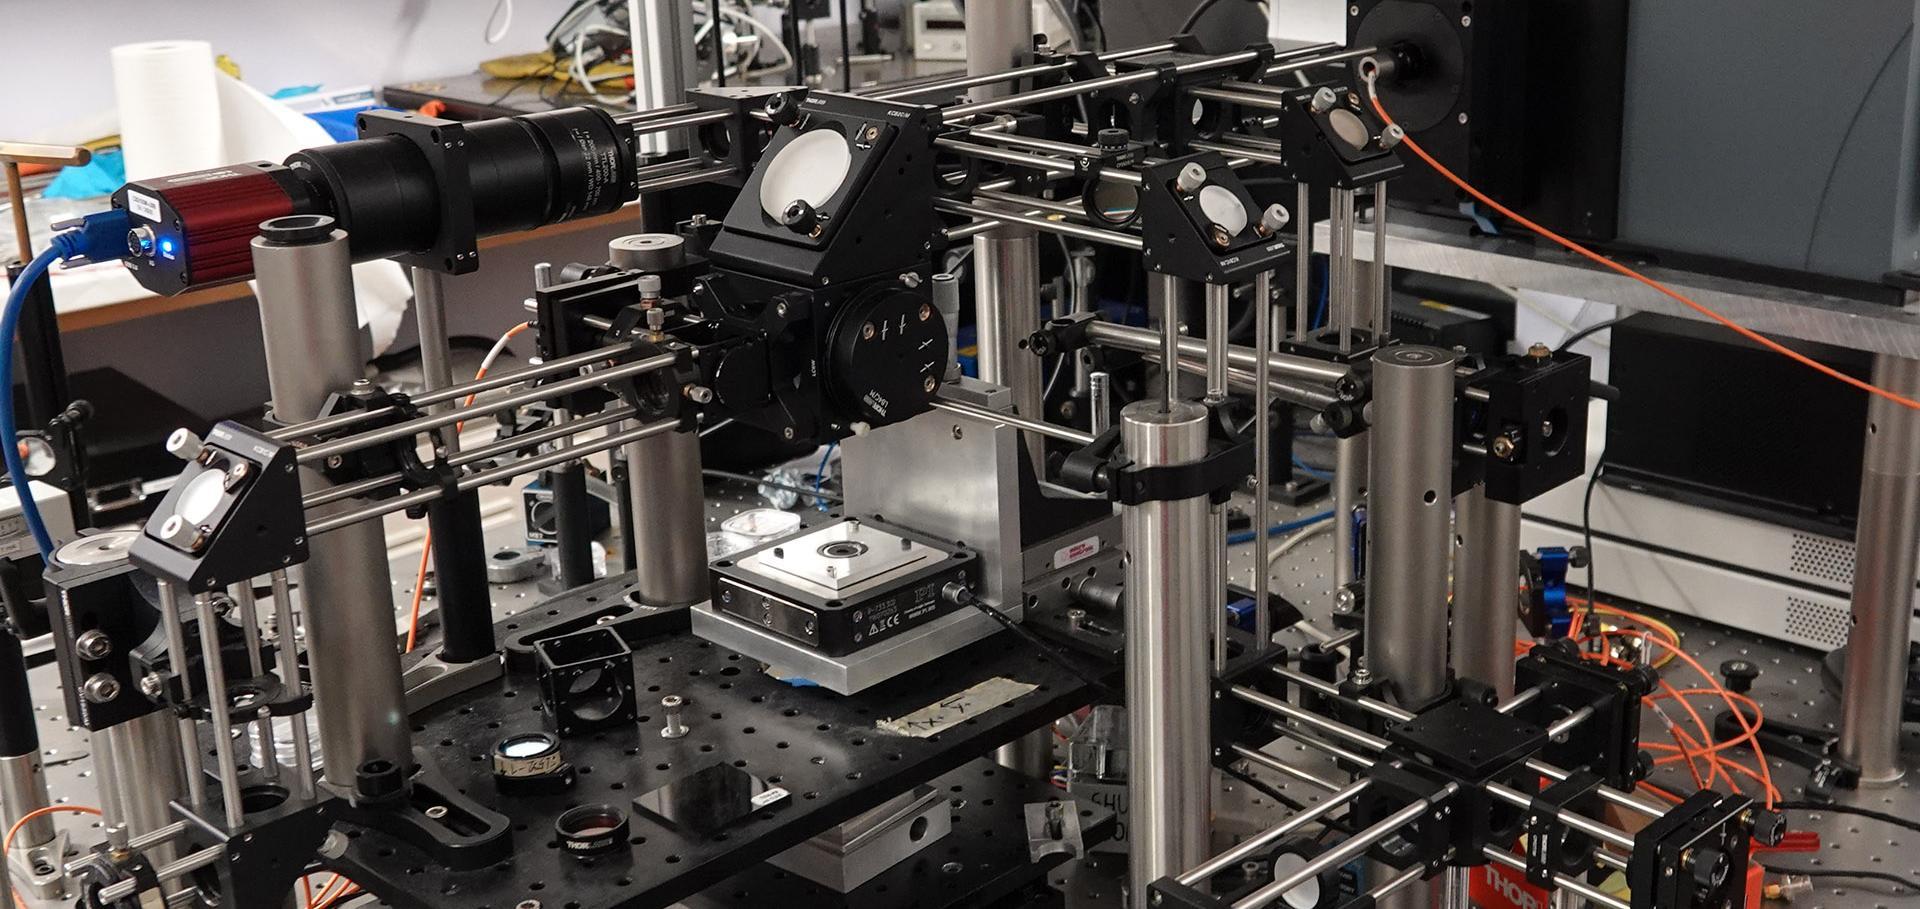 Micro-PL experimental apparatus